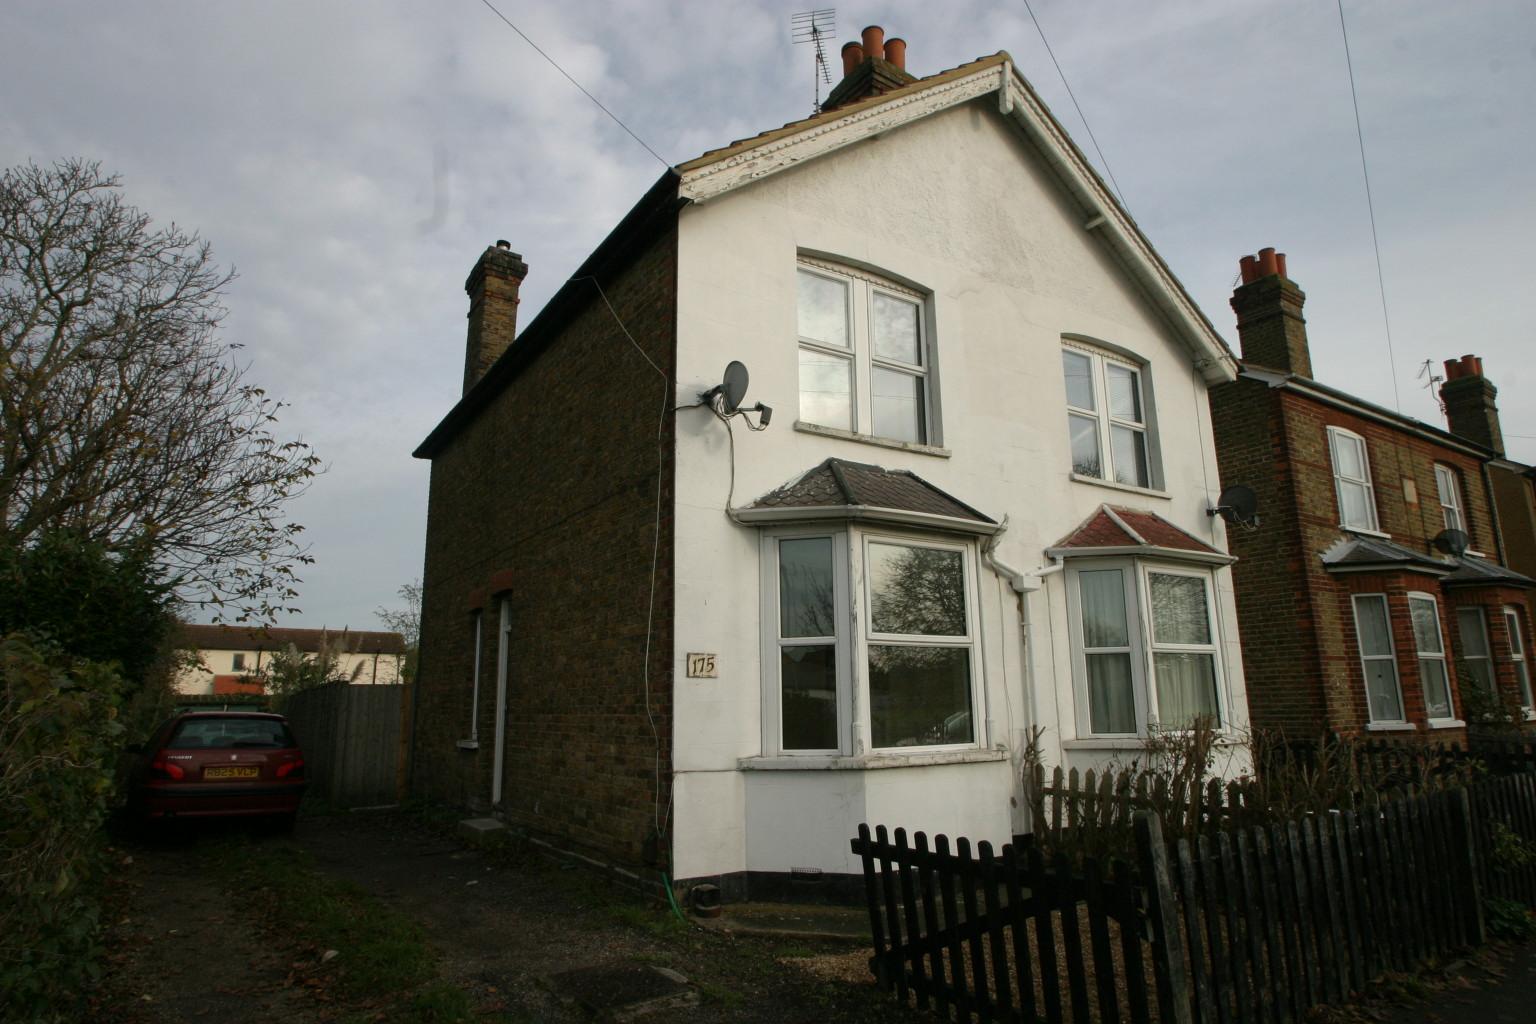 3 Bedroom Semi-Detached House, Egham